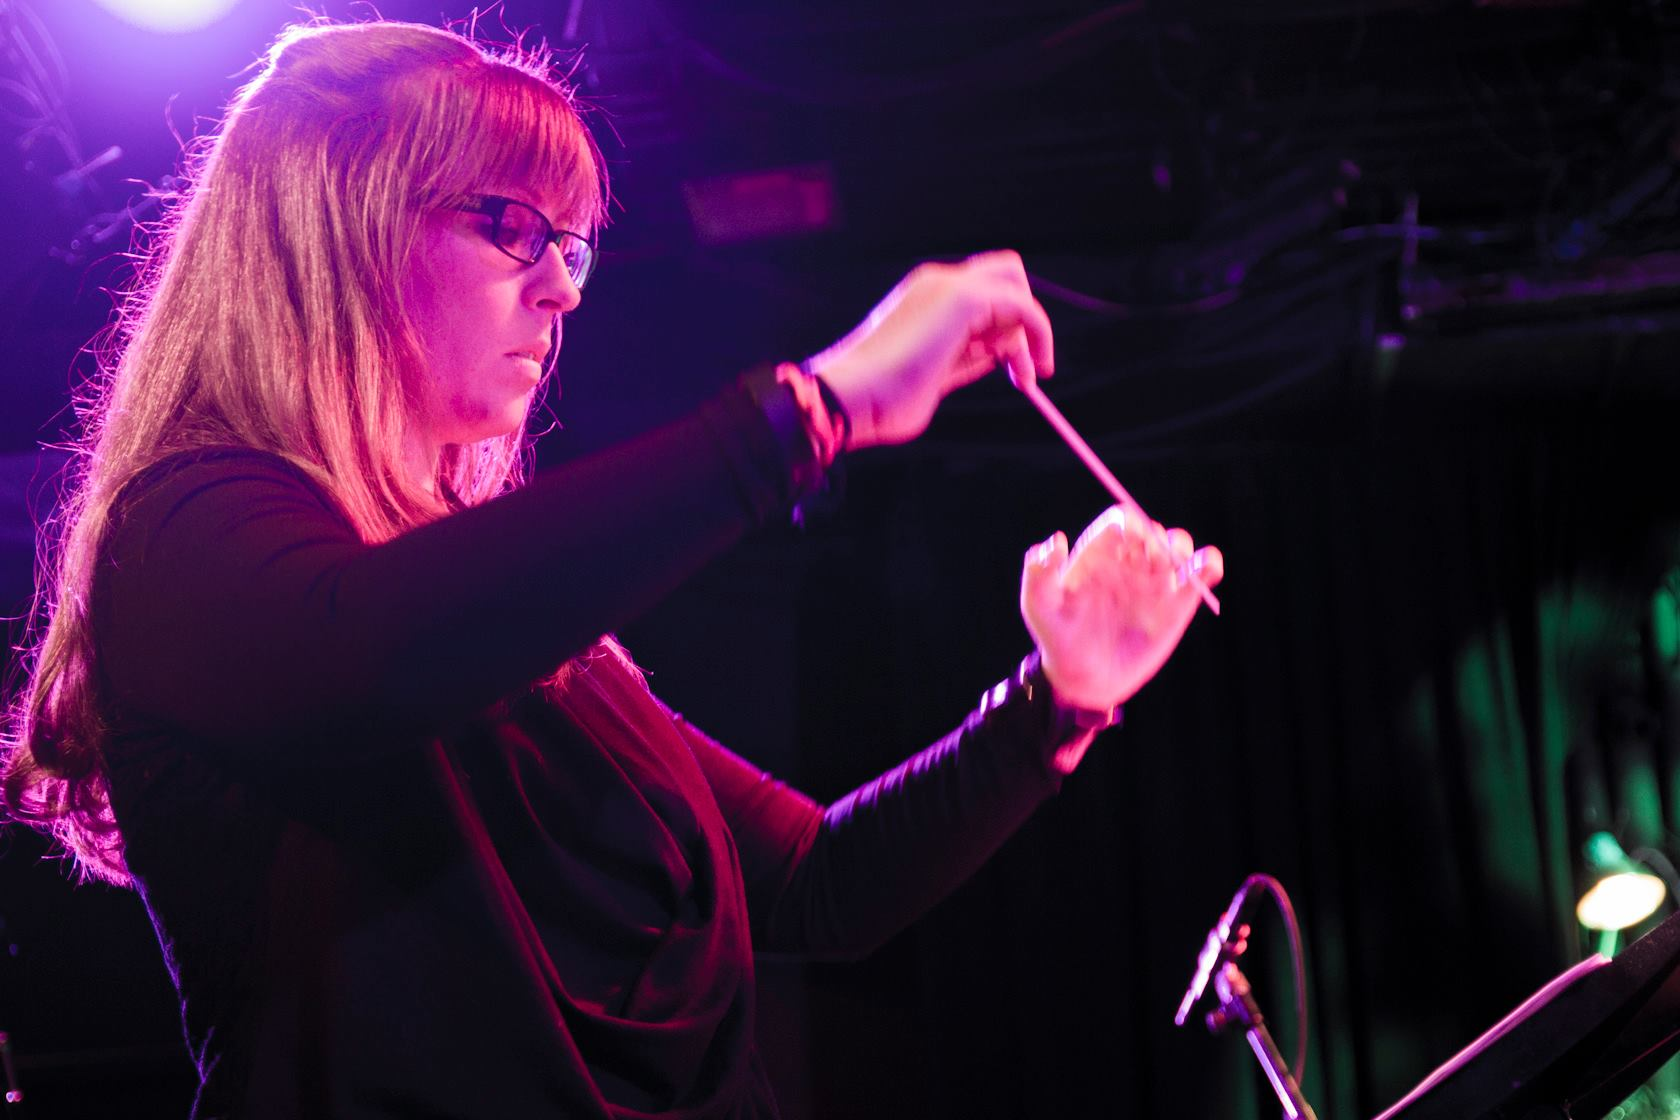 Conducting Hotel Elefant @ Subculture, 2014